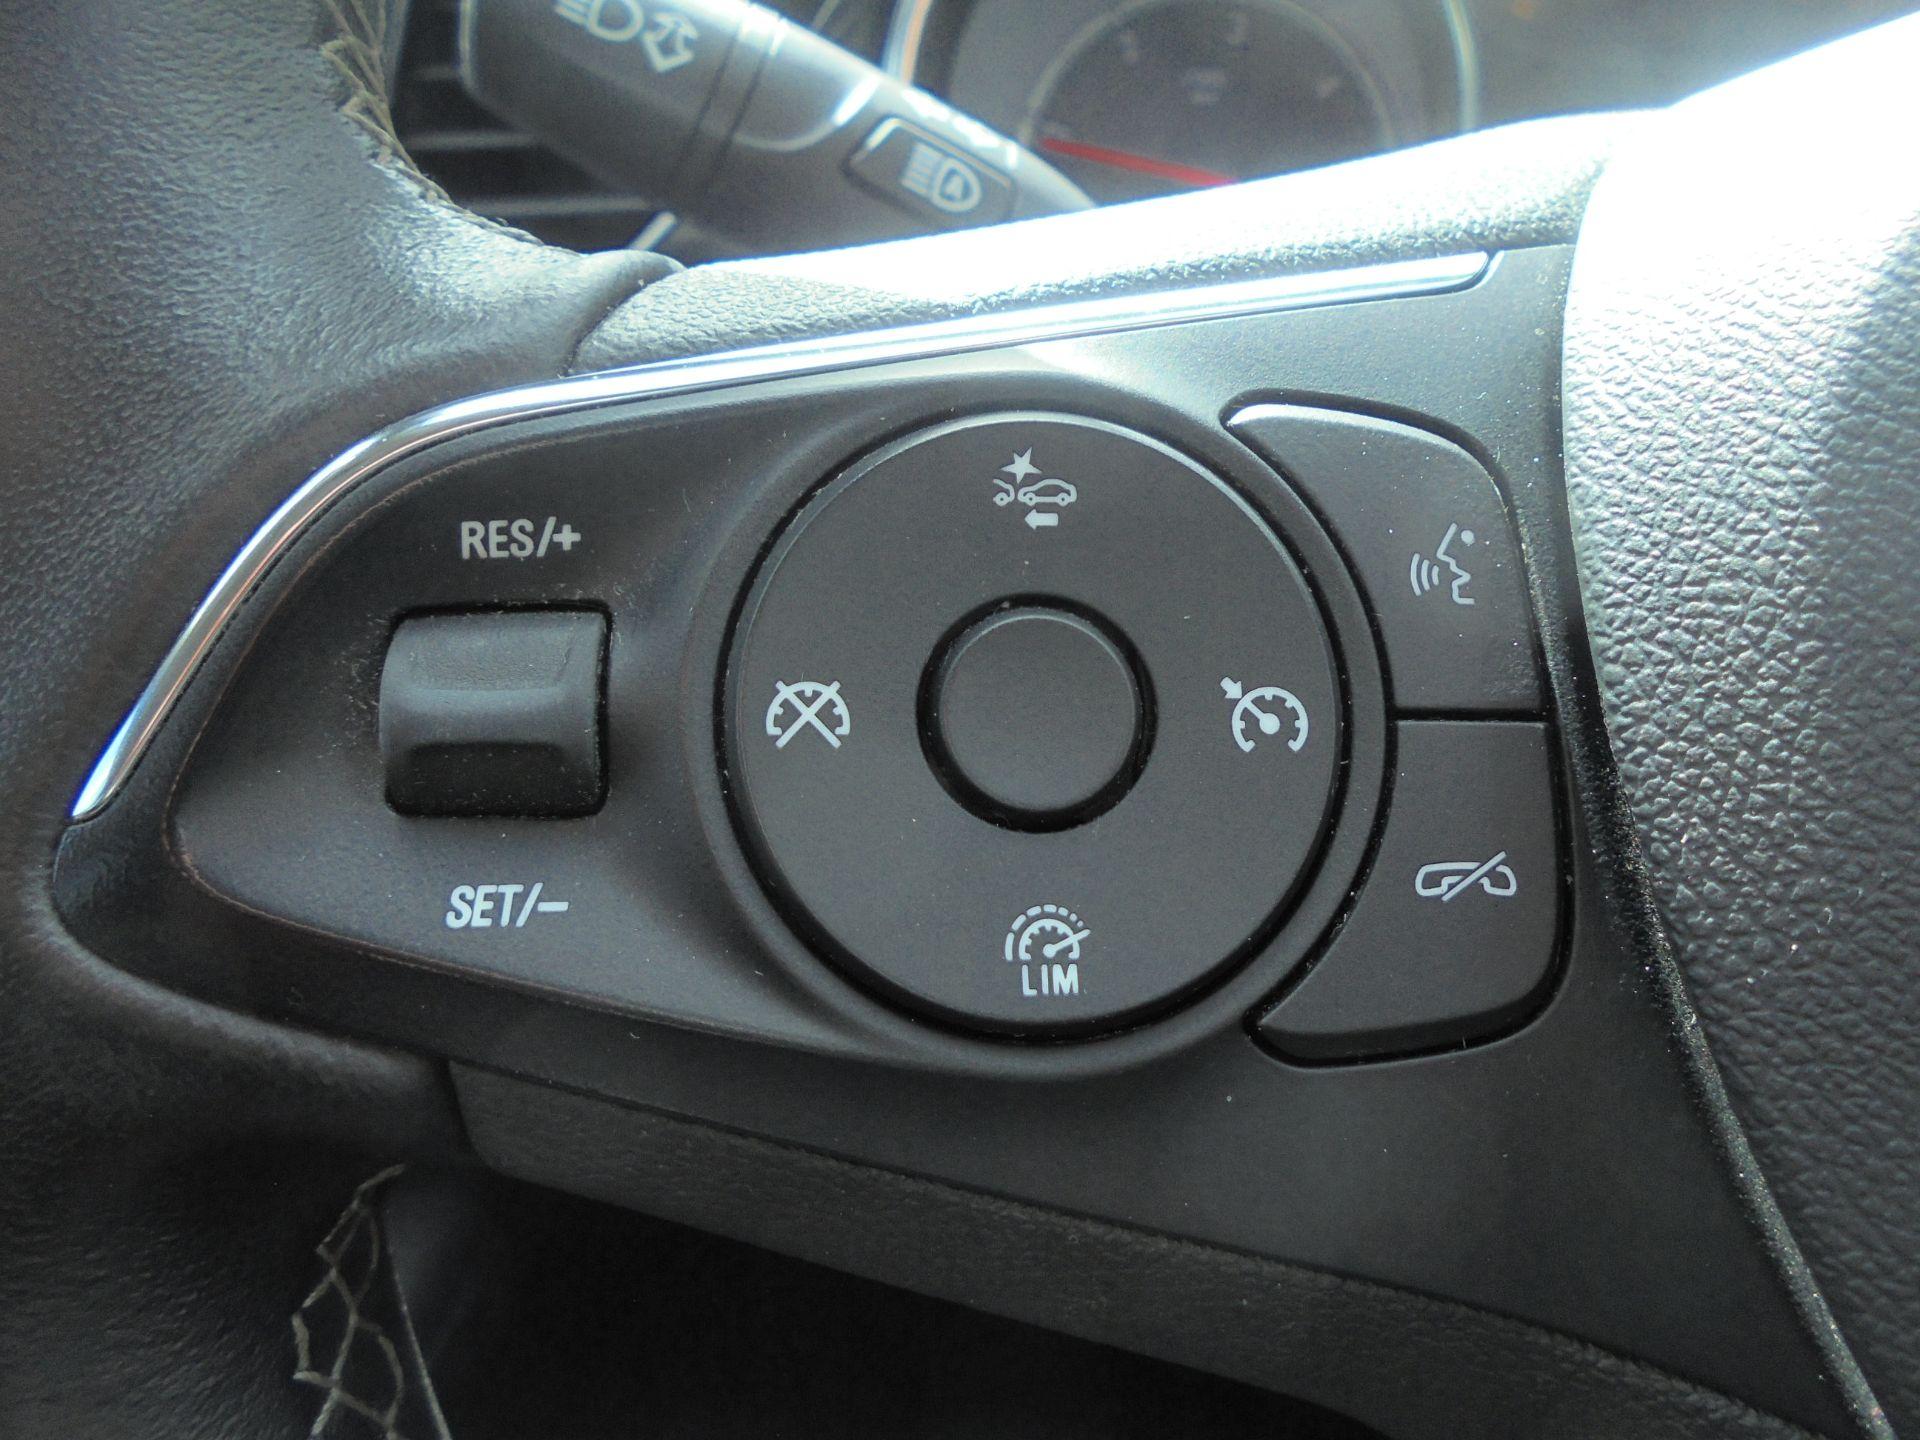 2018 Vauxhall Insignia Grand Sport 1.6 Turbo D Ecotec [136] Sri Nav 5Dr (VU18DFF) Image 14